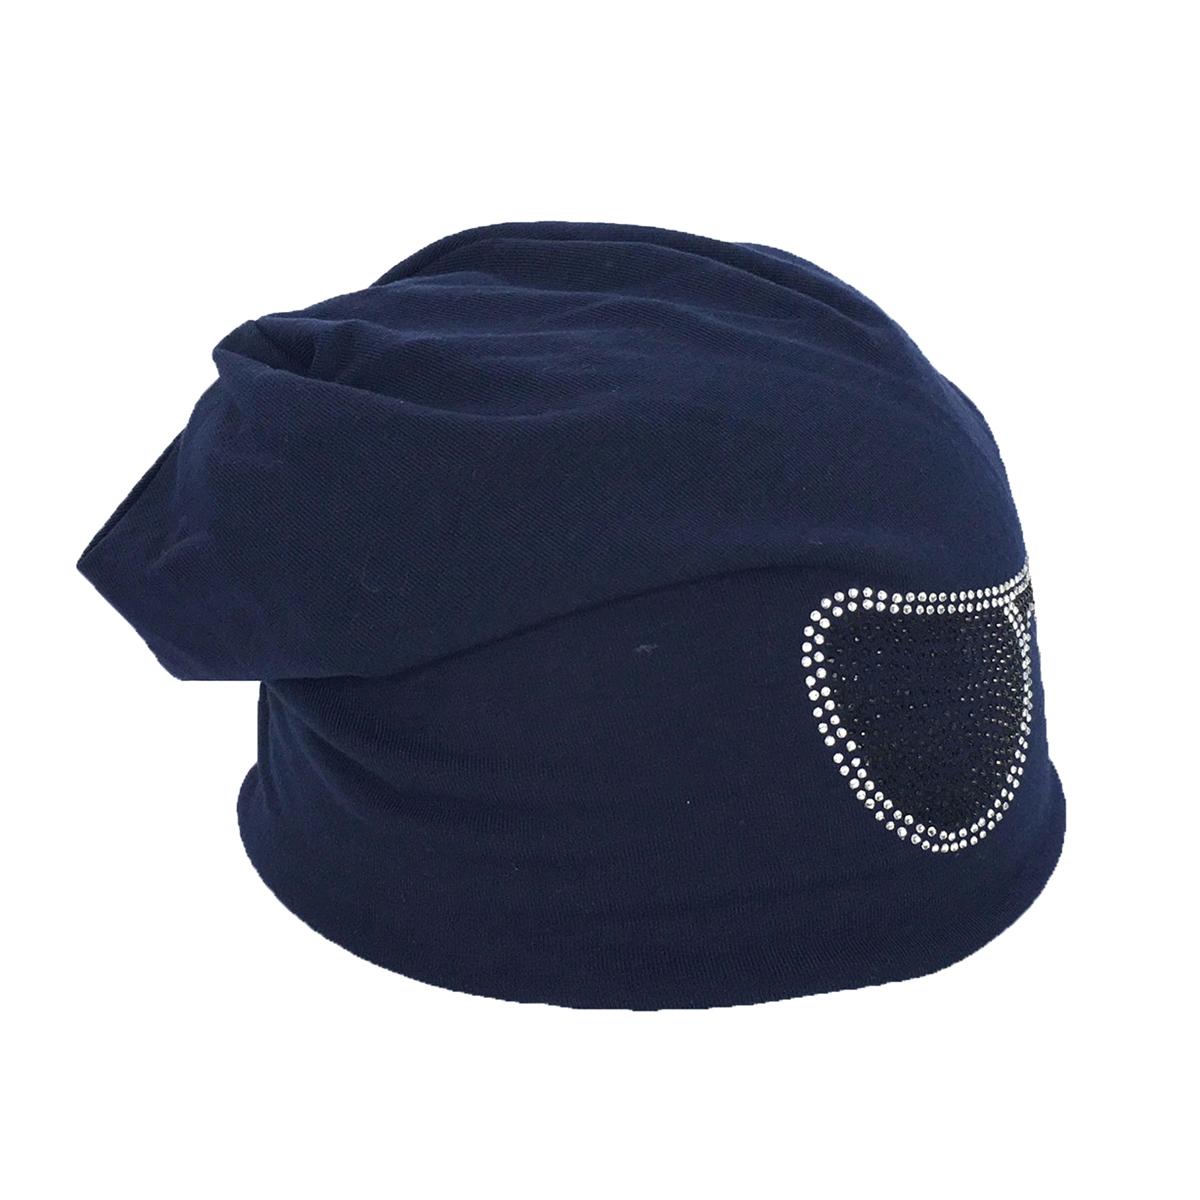 ecffb243636 Fashion Culture Geebro Women s Bling Sunglasses Slouchy Beanie Hat